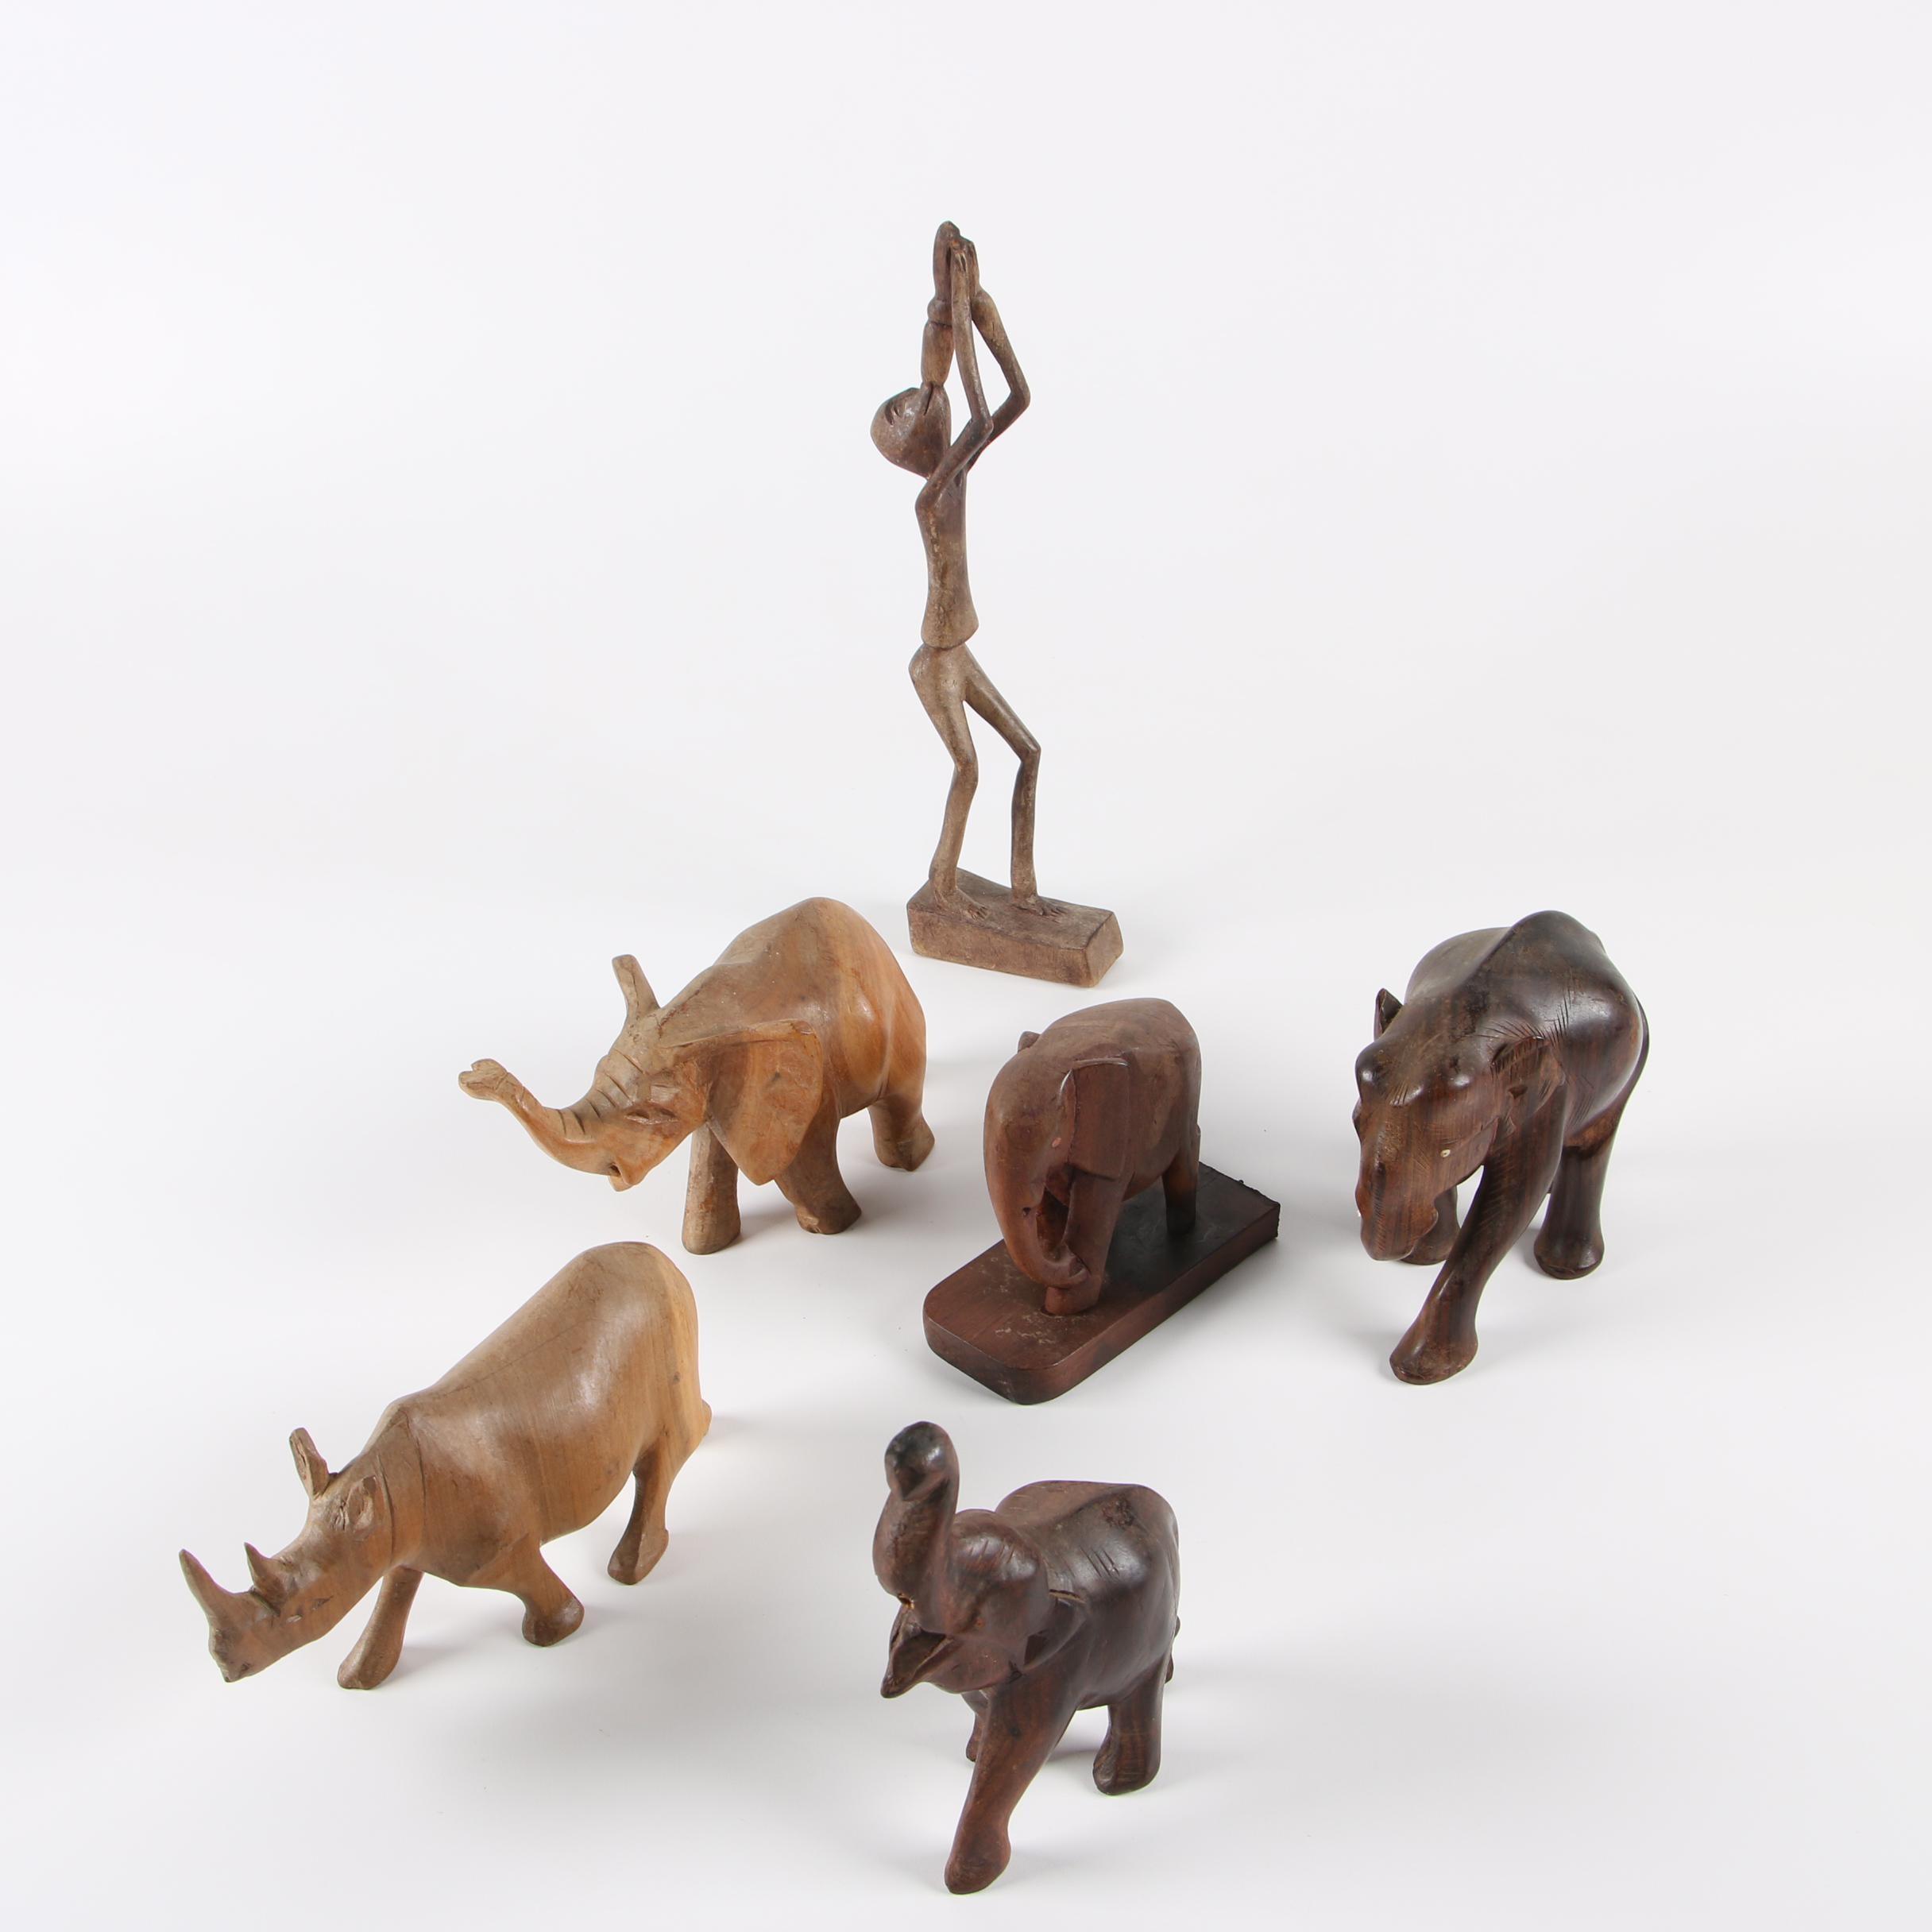 Carved Wood Elephants, Rhinoceros and Figure